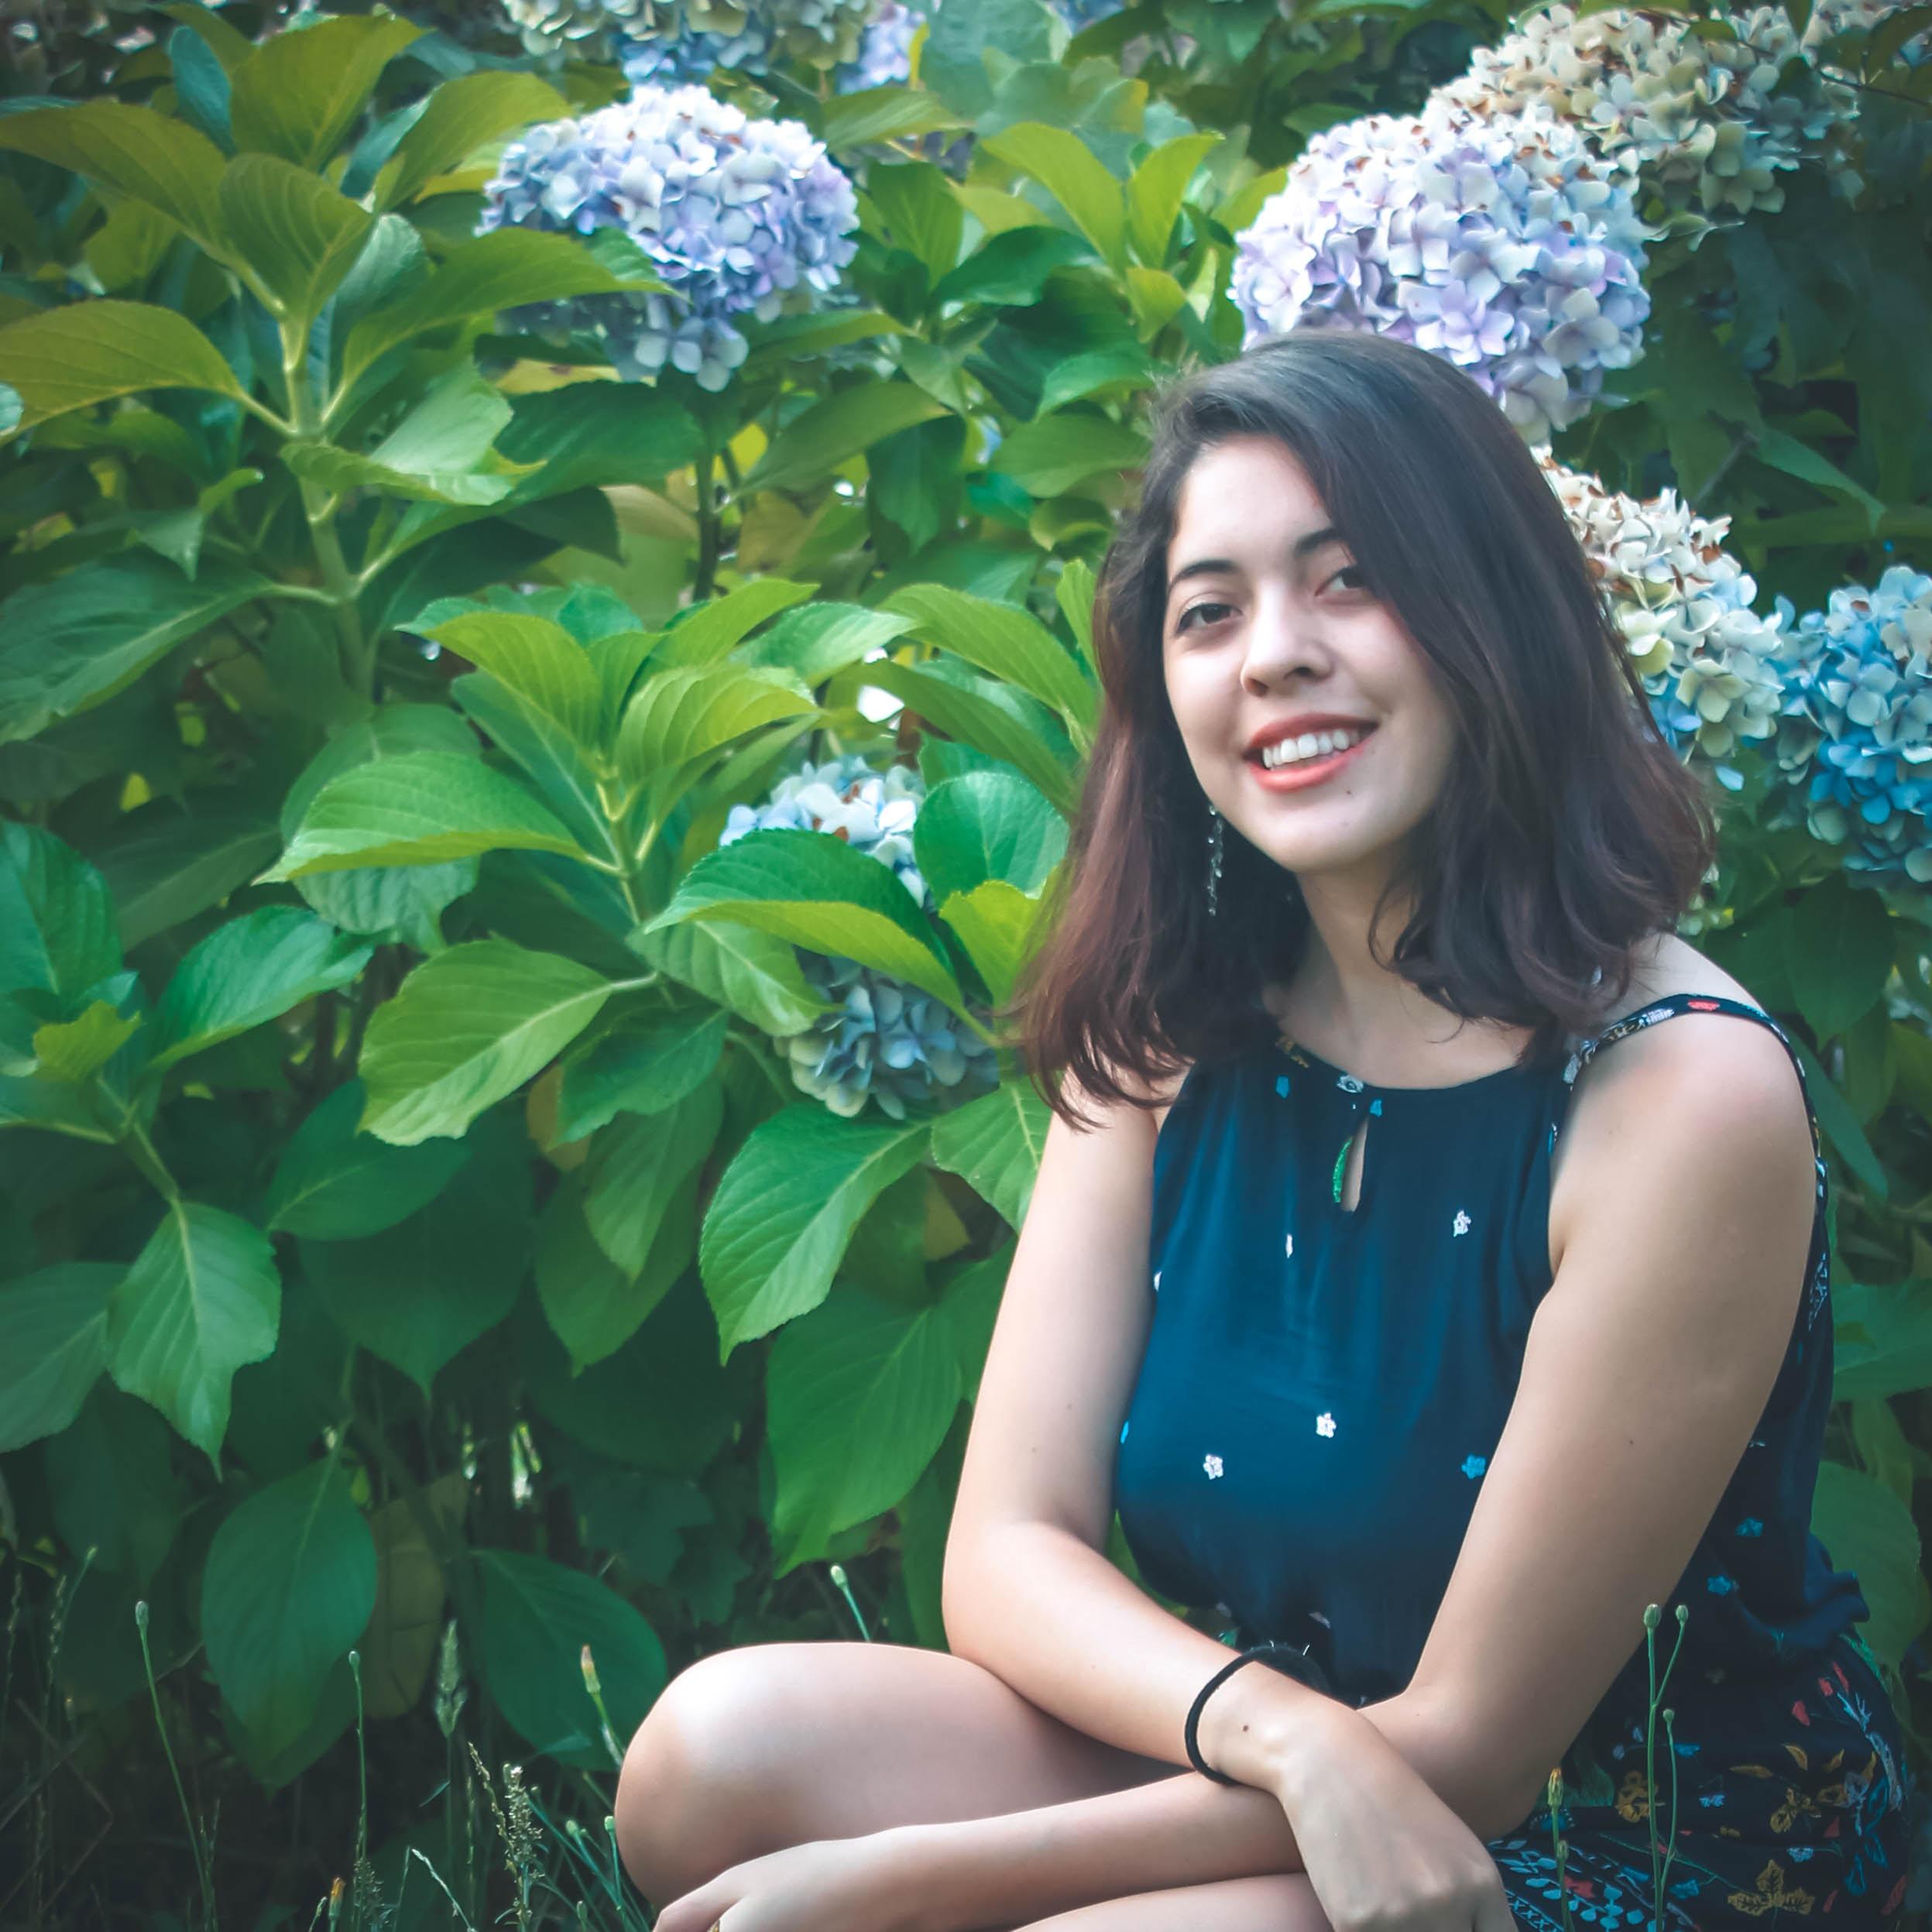 Go to Valentina Dominguez's profile